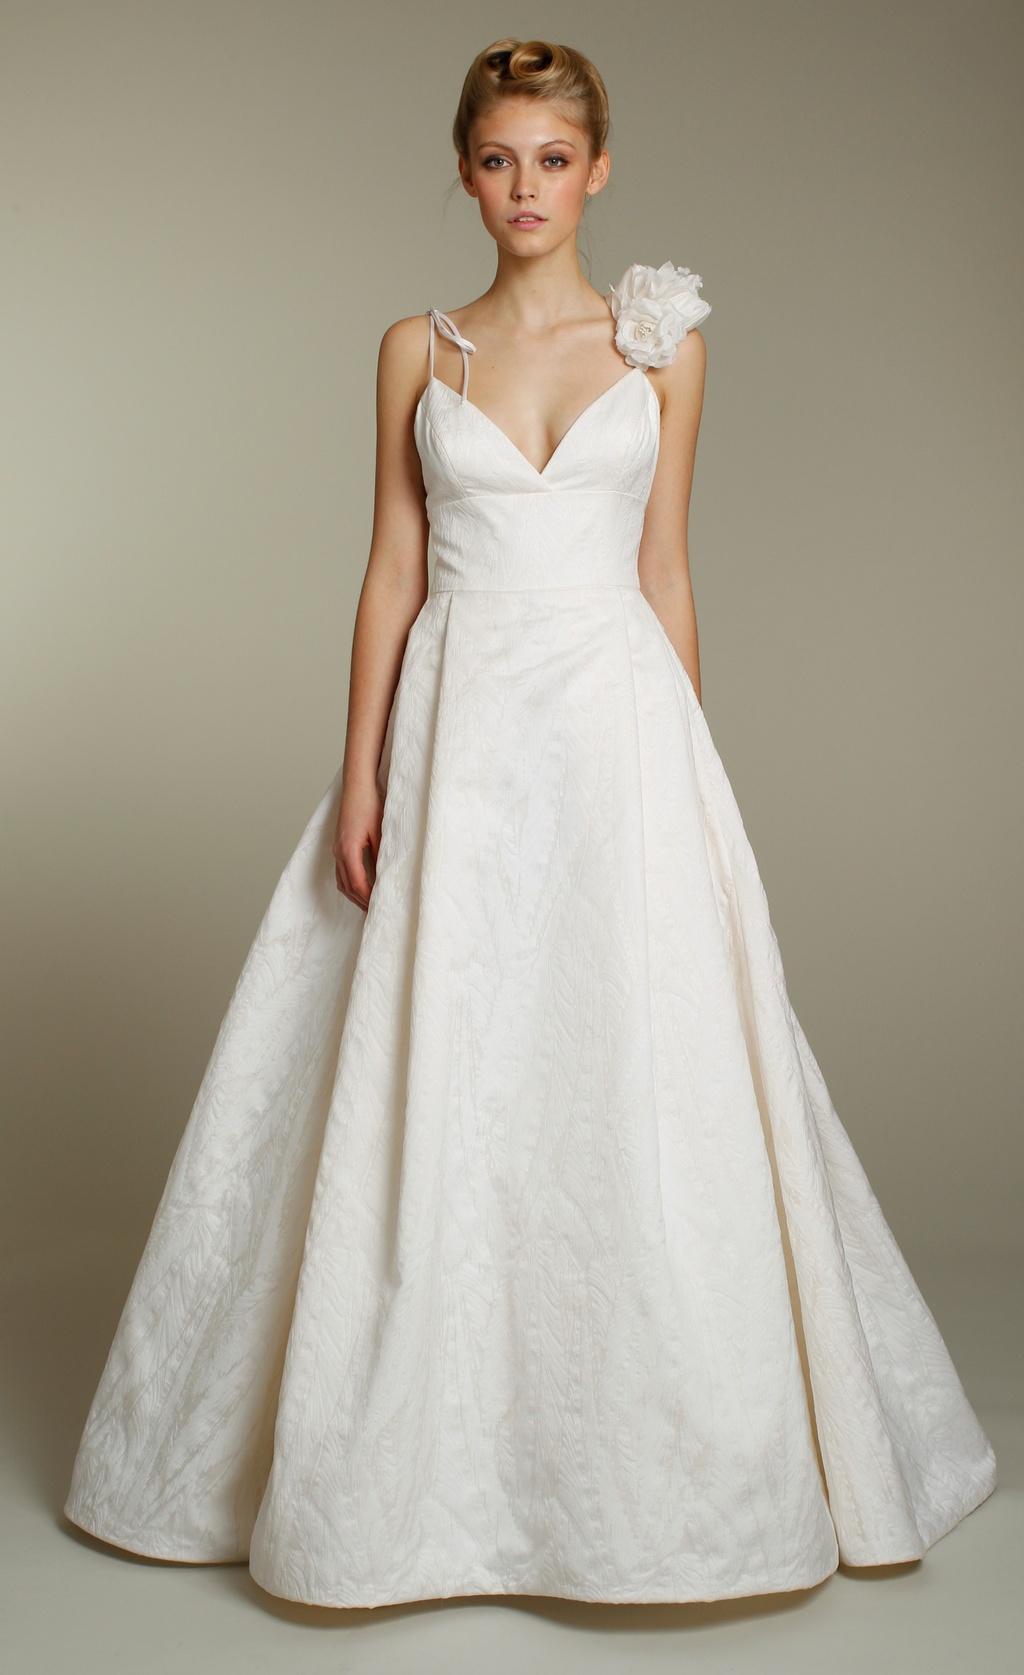 2154-wedding-dress-fall-2011-tara-keeley-ivory-a-line-v-neck.full